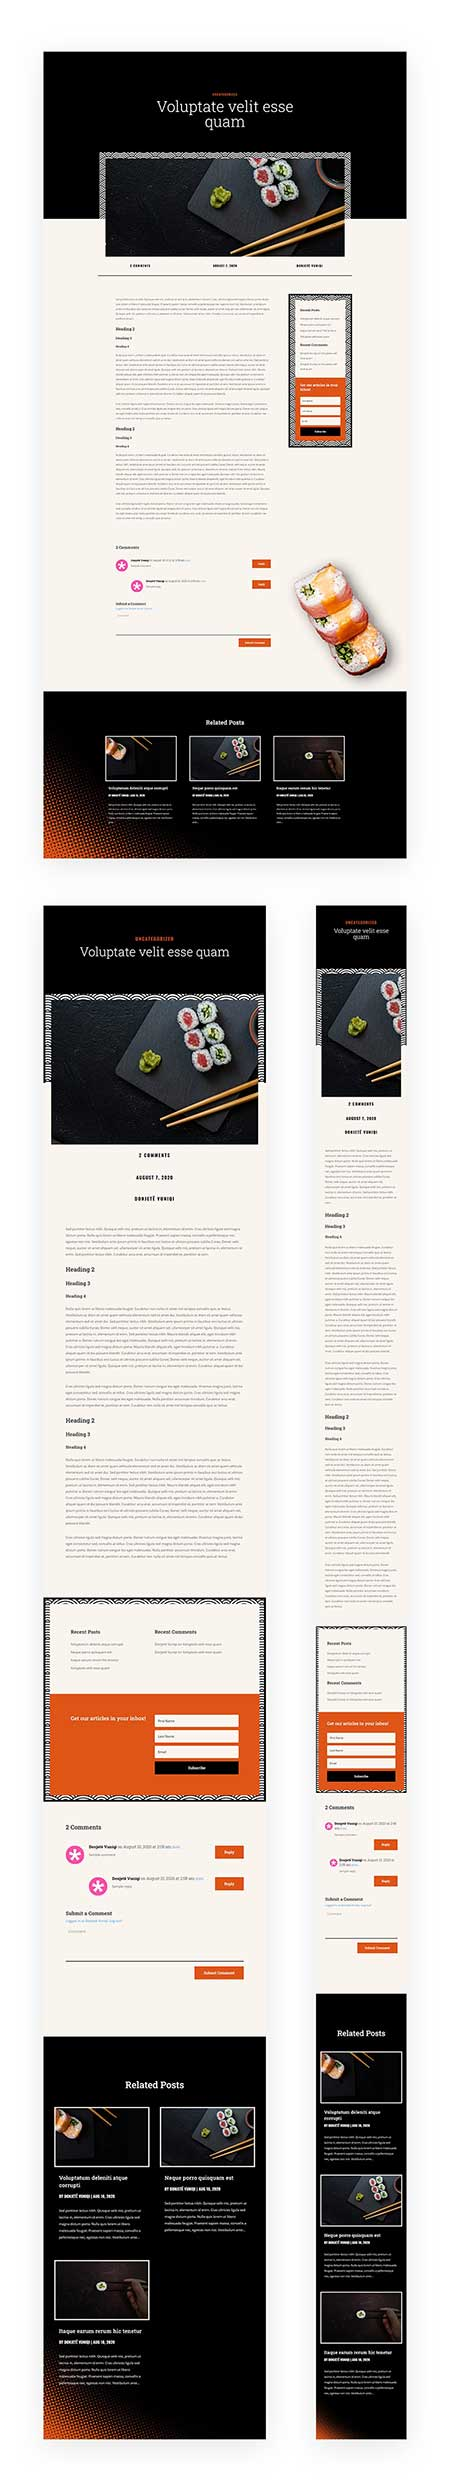 Divi sushu shop blog post template